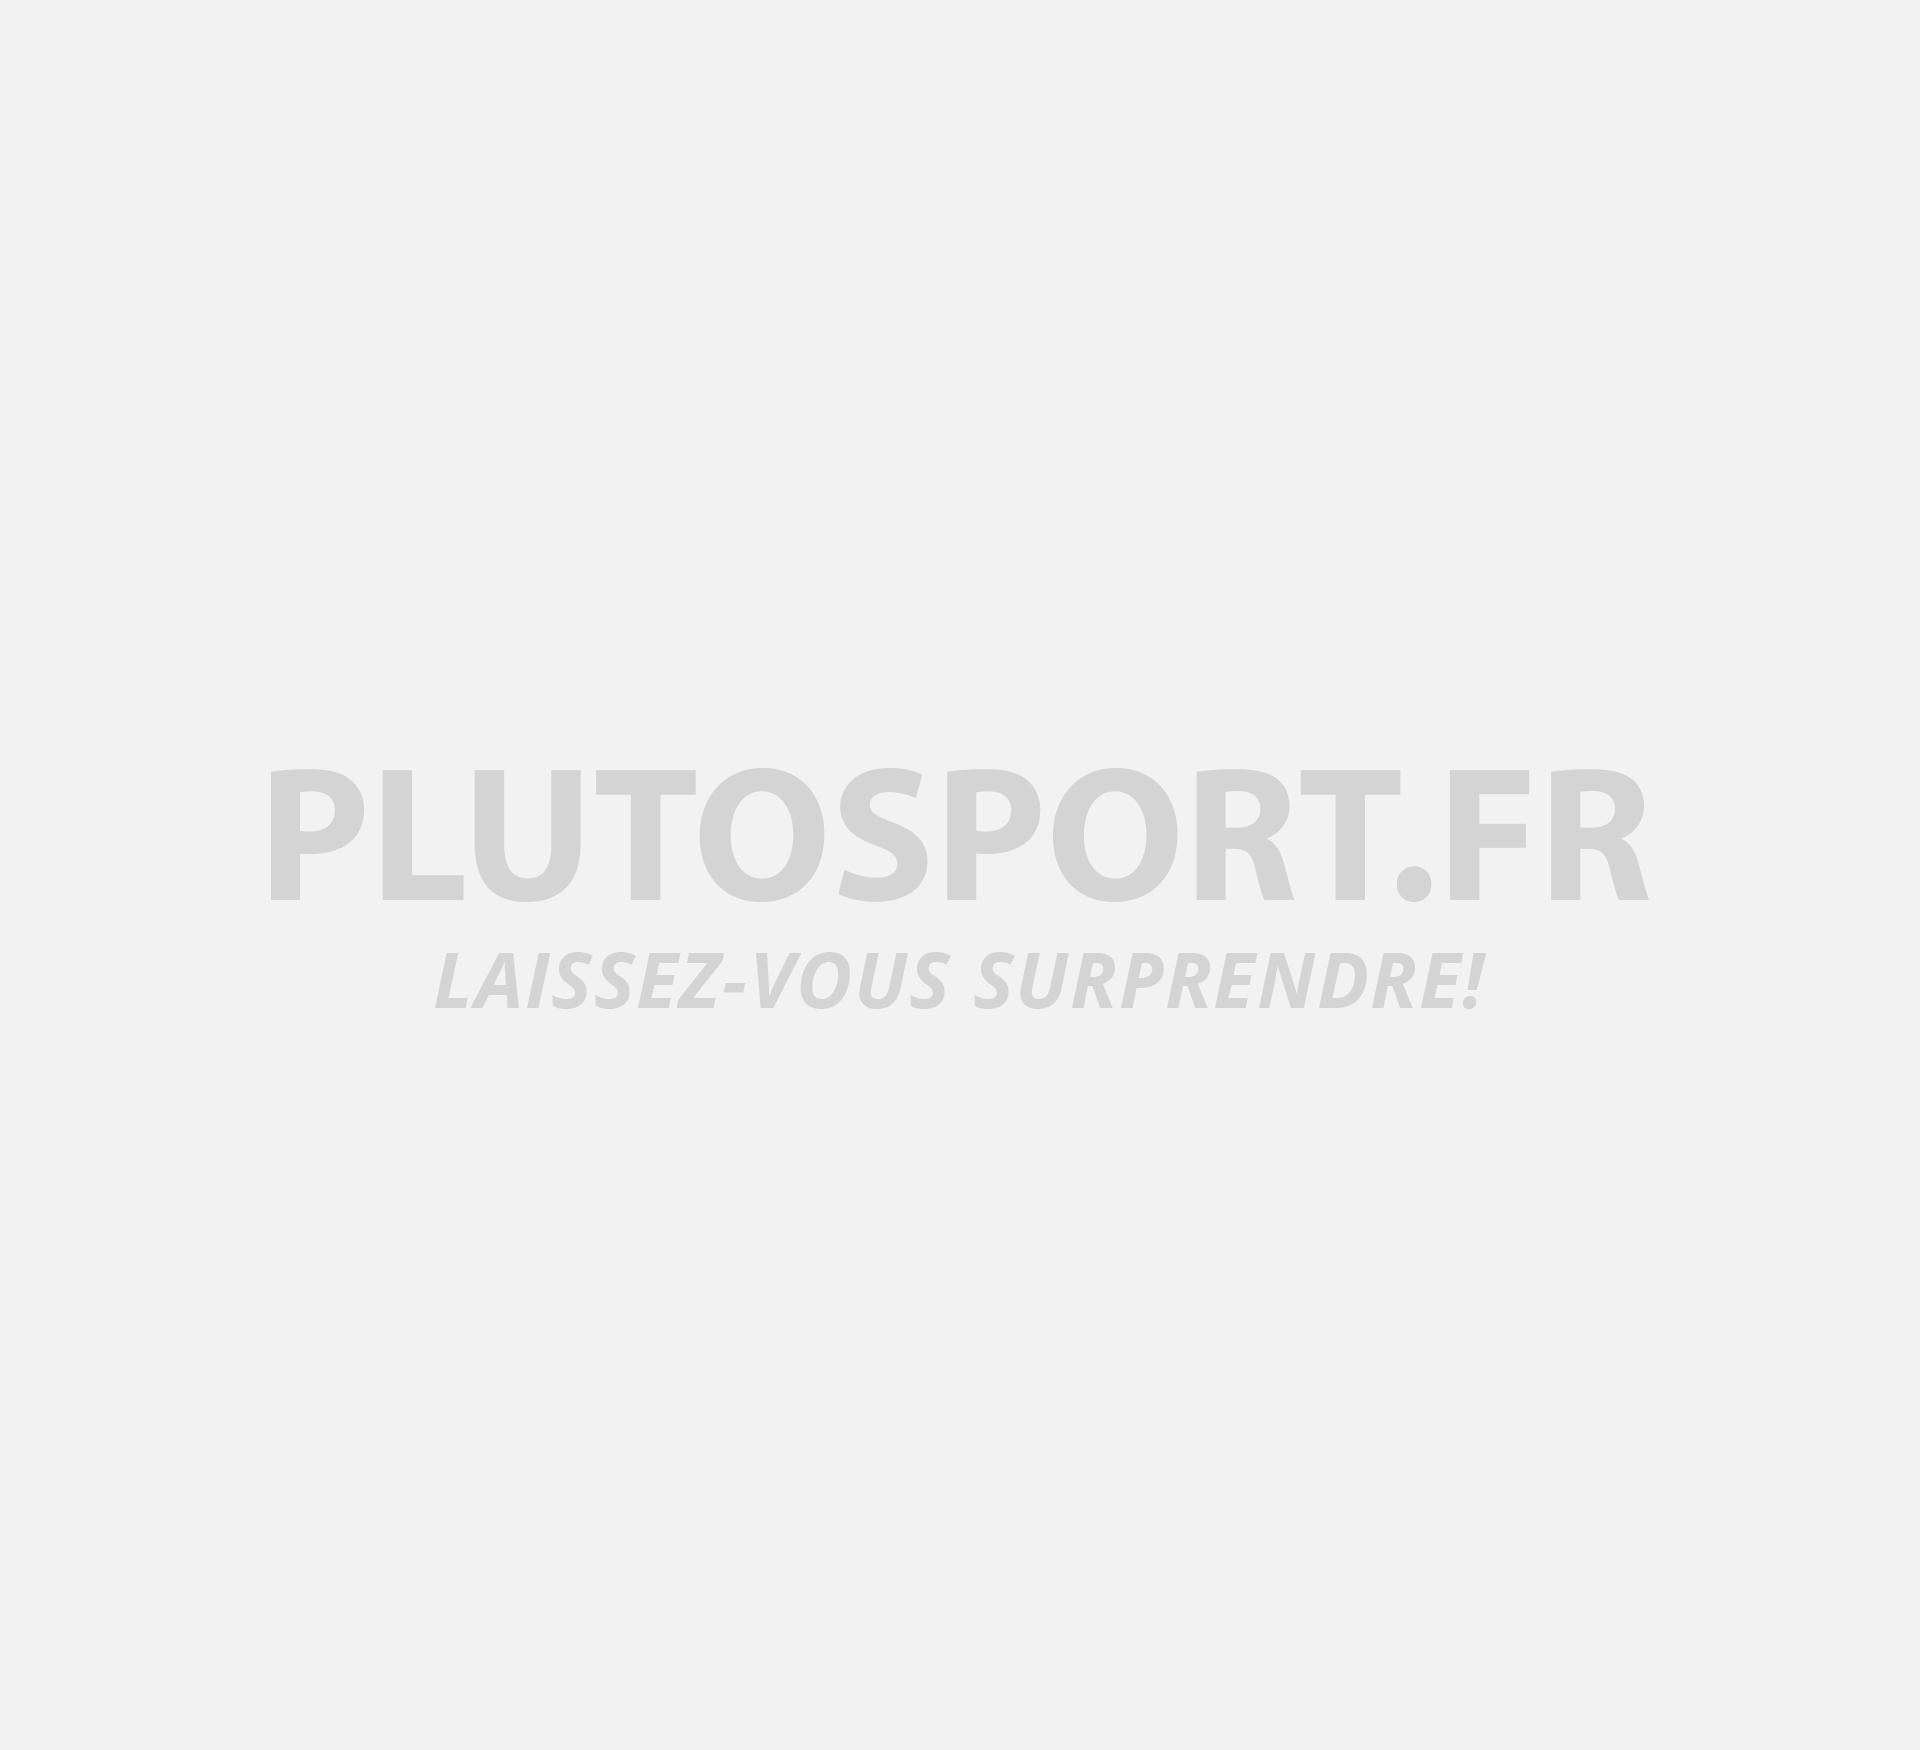 Dunlop Hyper TI 4.0 Raquette de Squash Senior